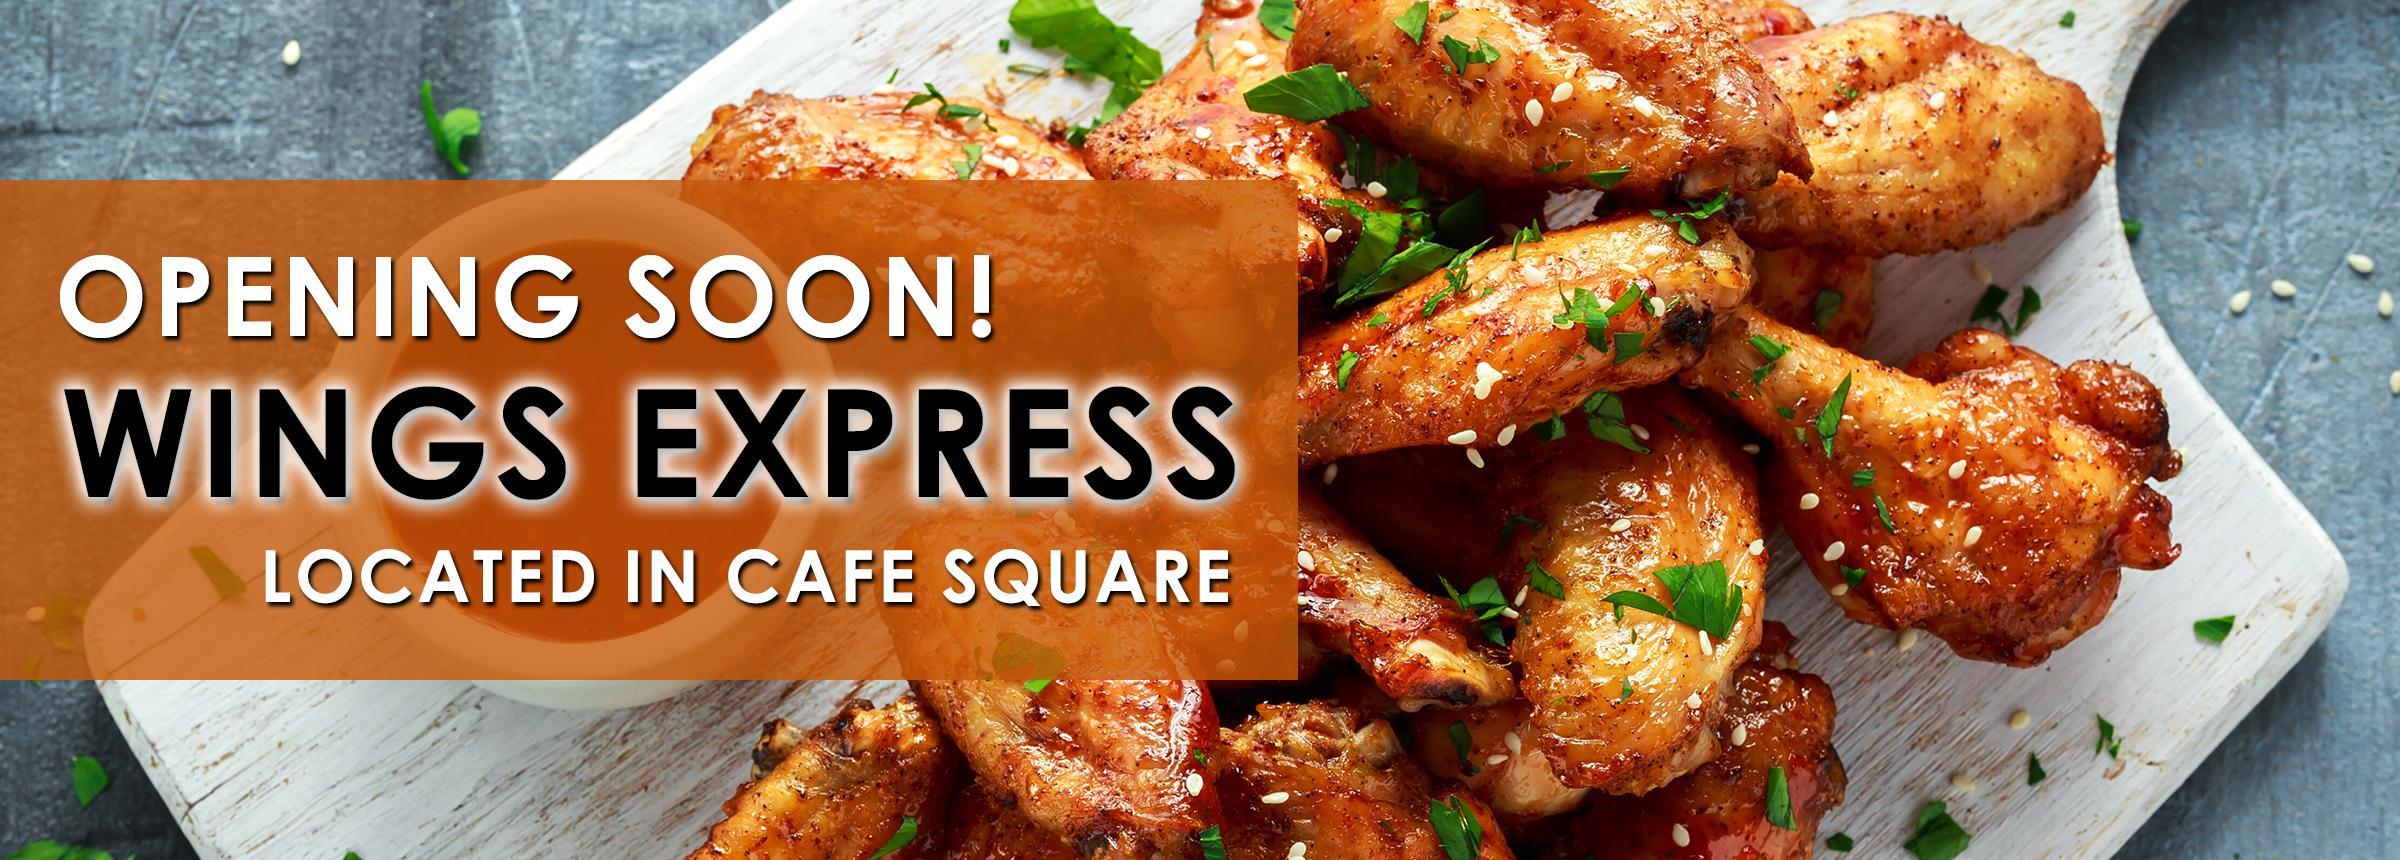 Wings Express Opening Soon 06 30 20